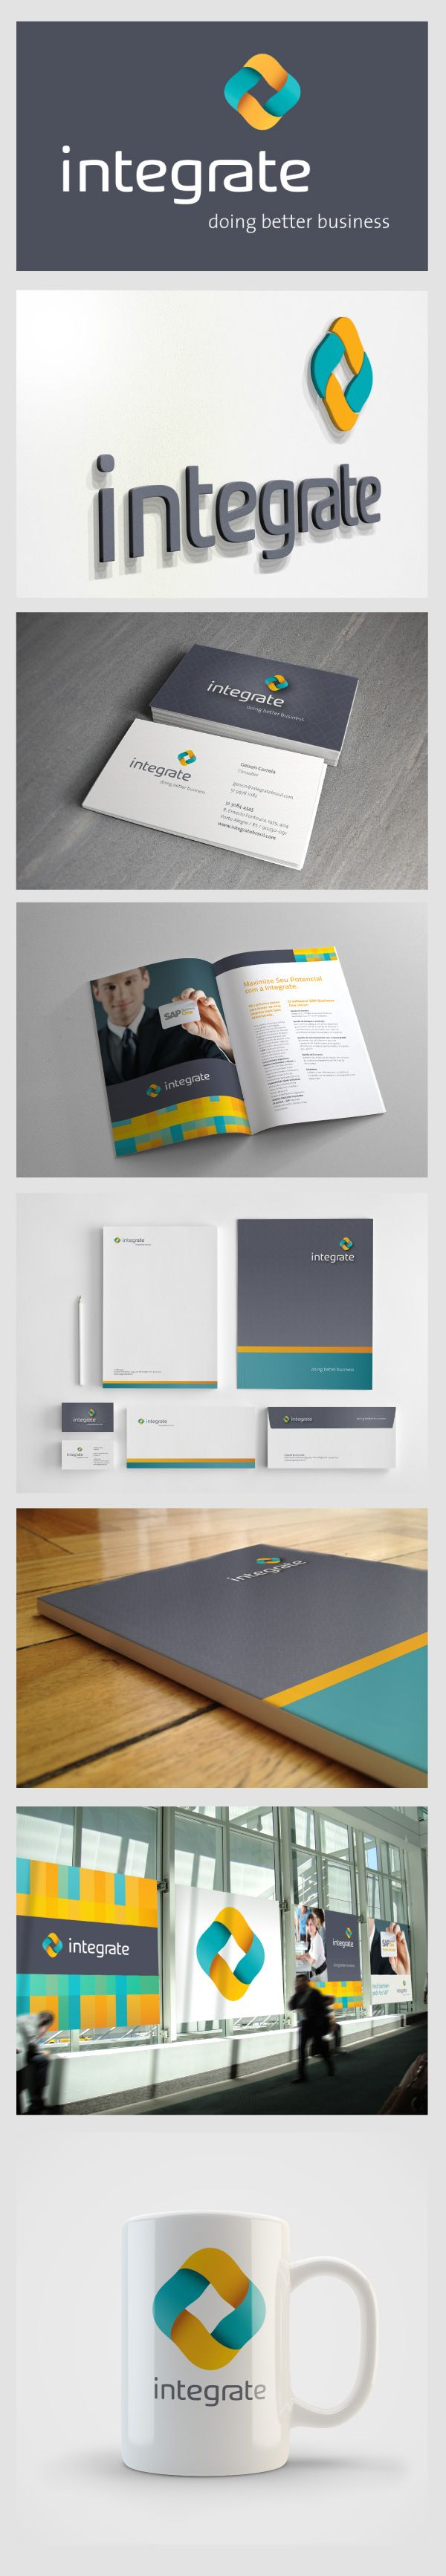 integrate branding # booklet design | #stationary #corporate #design #corporatedesign #identity #branding #marketing < repinned by www.BlickeDeeler.de | Take a look at www.LogoGestaltung-Hamburg.de